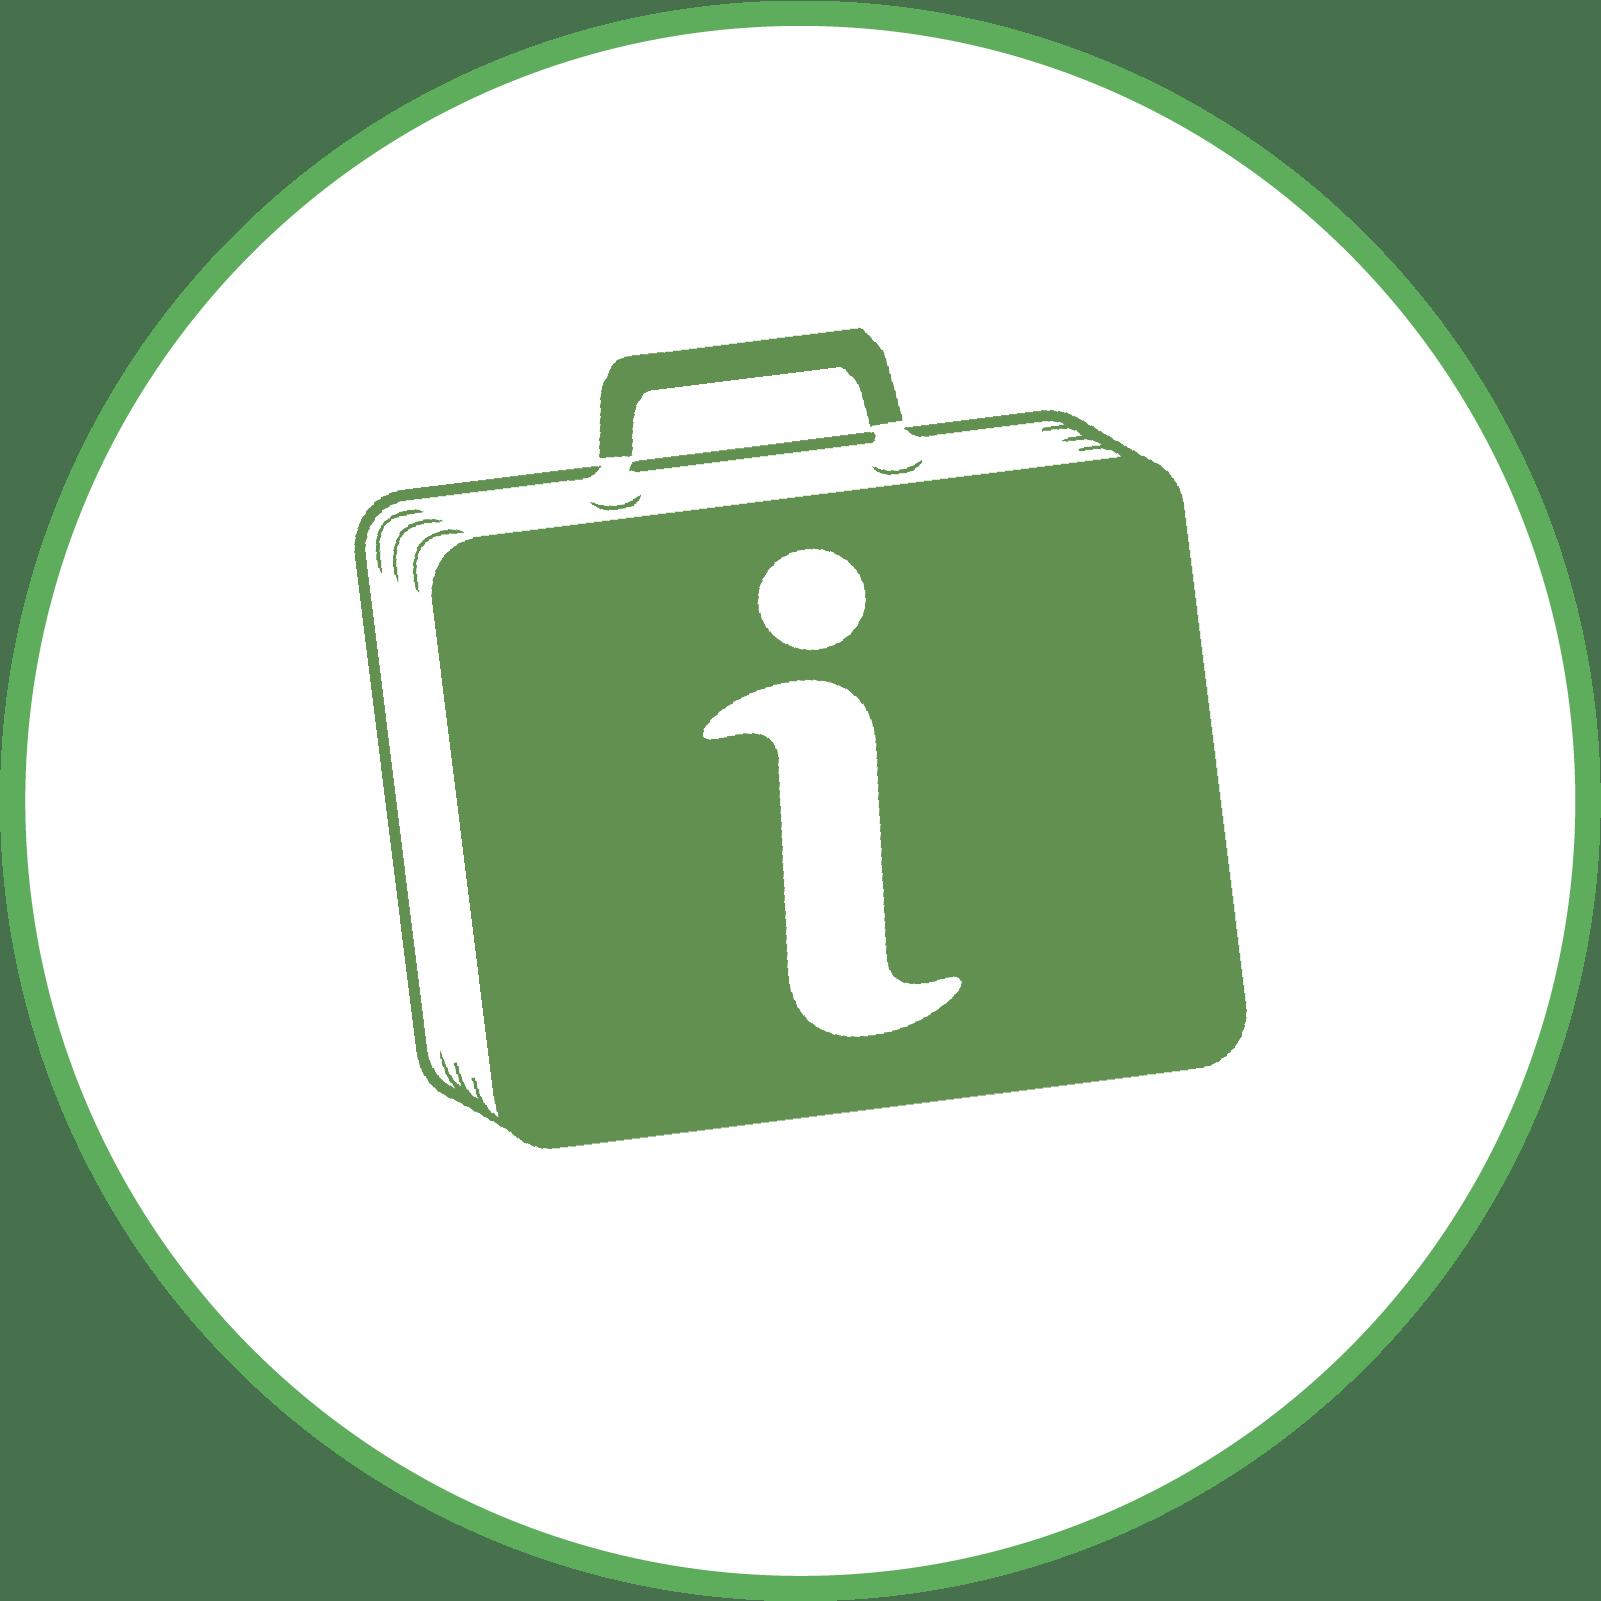 Delayed lost or damaged baggage